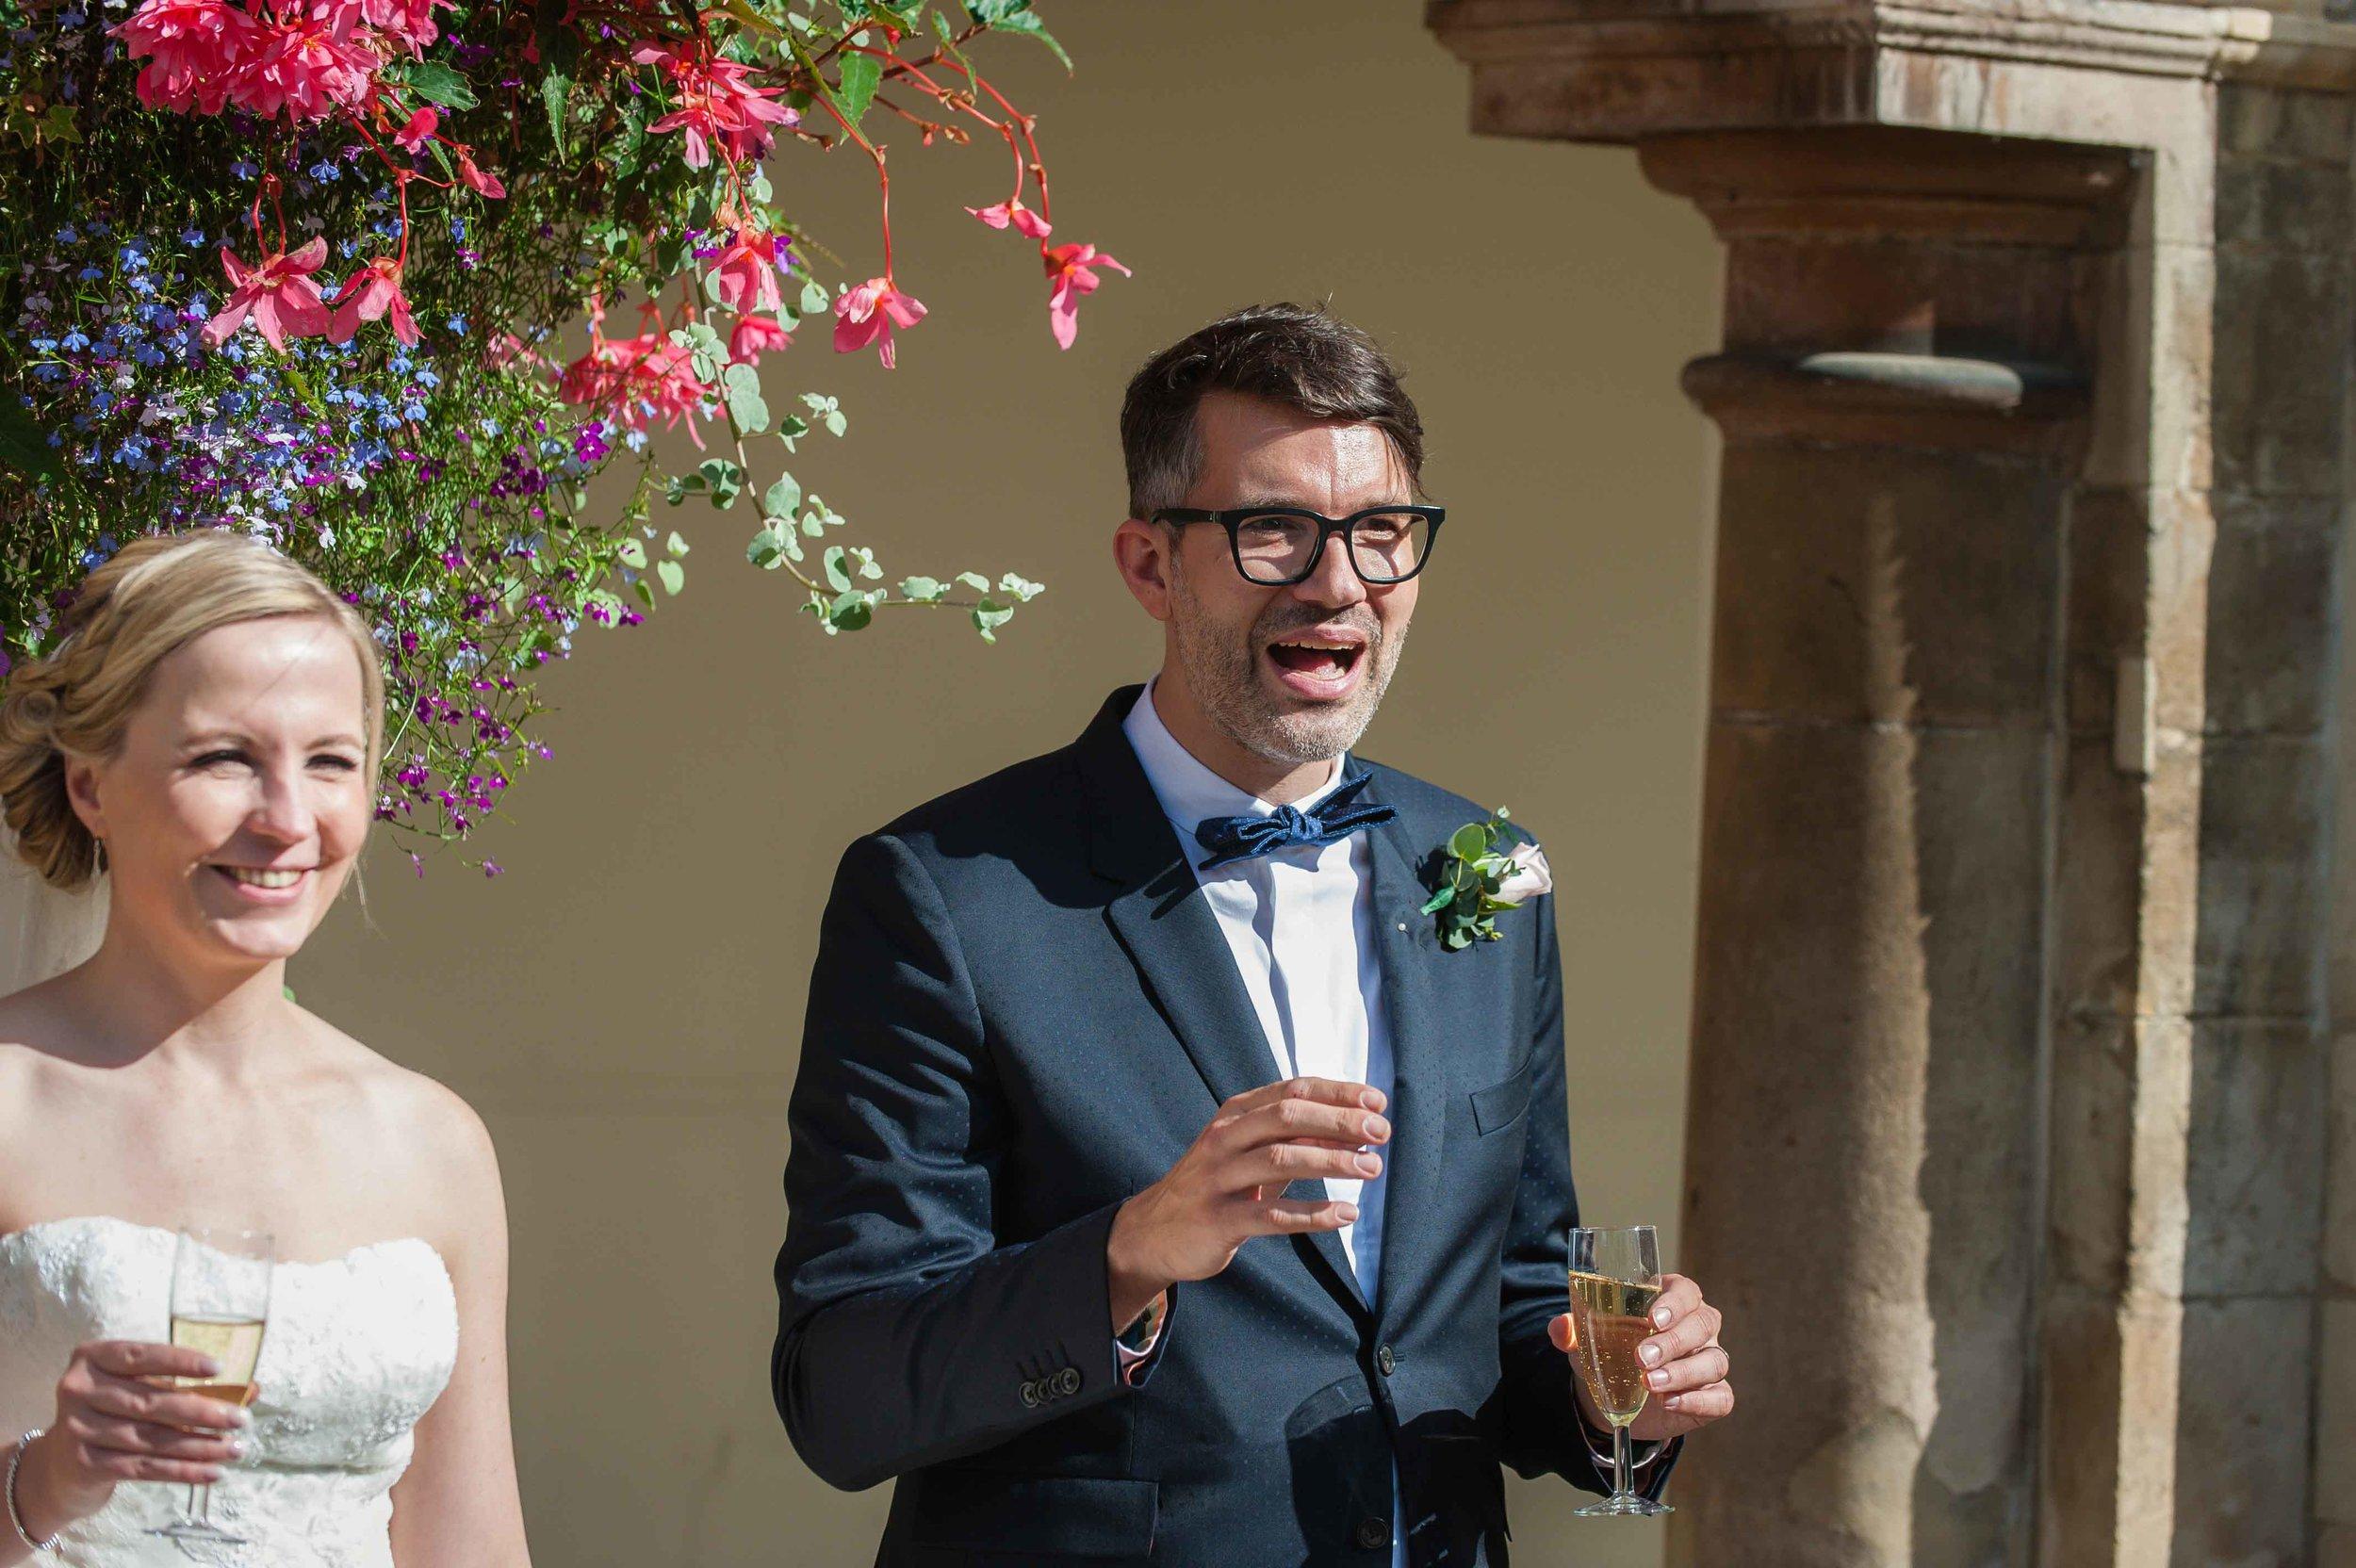 Adrian_Nicole_Charnwood_Weddings_Queens_College_Cambridge-1054.jpg